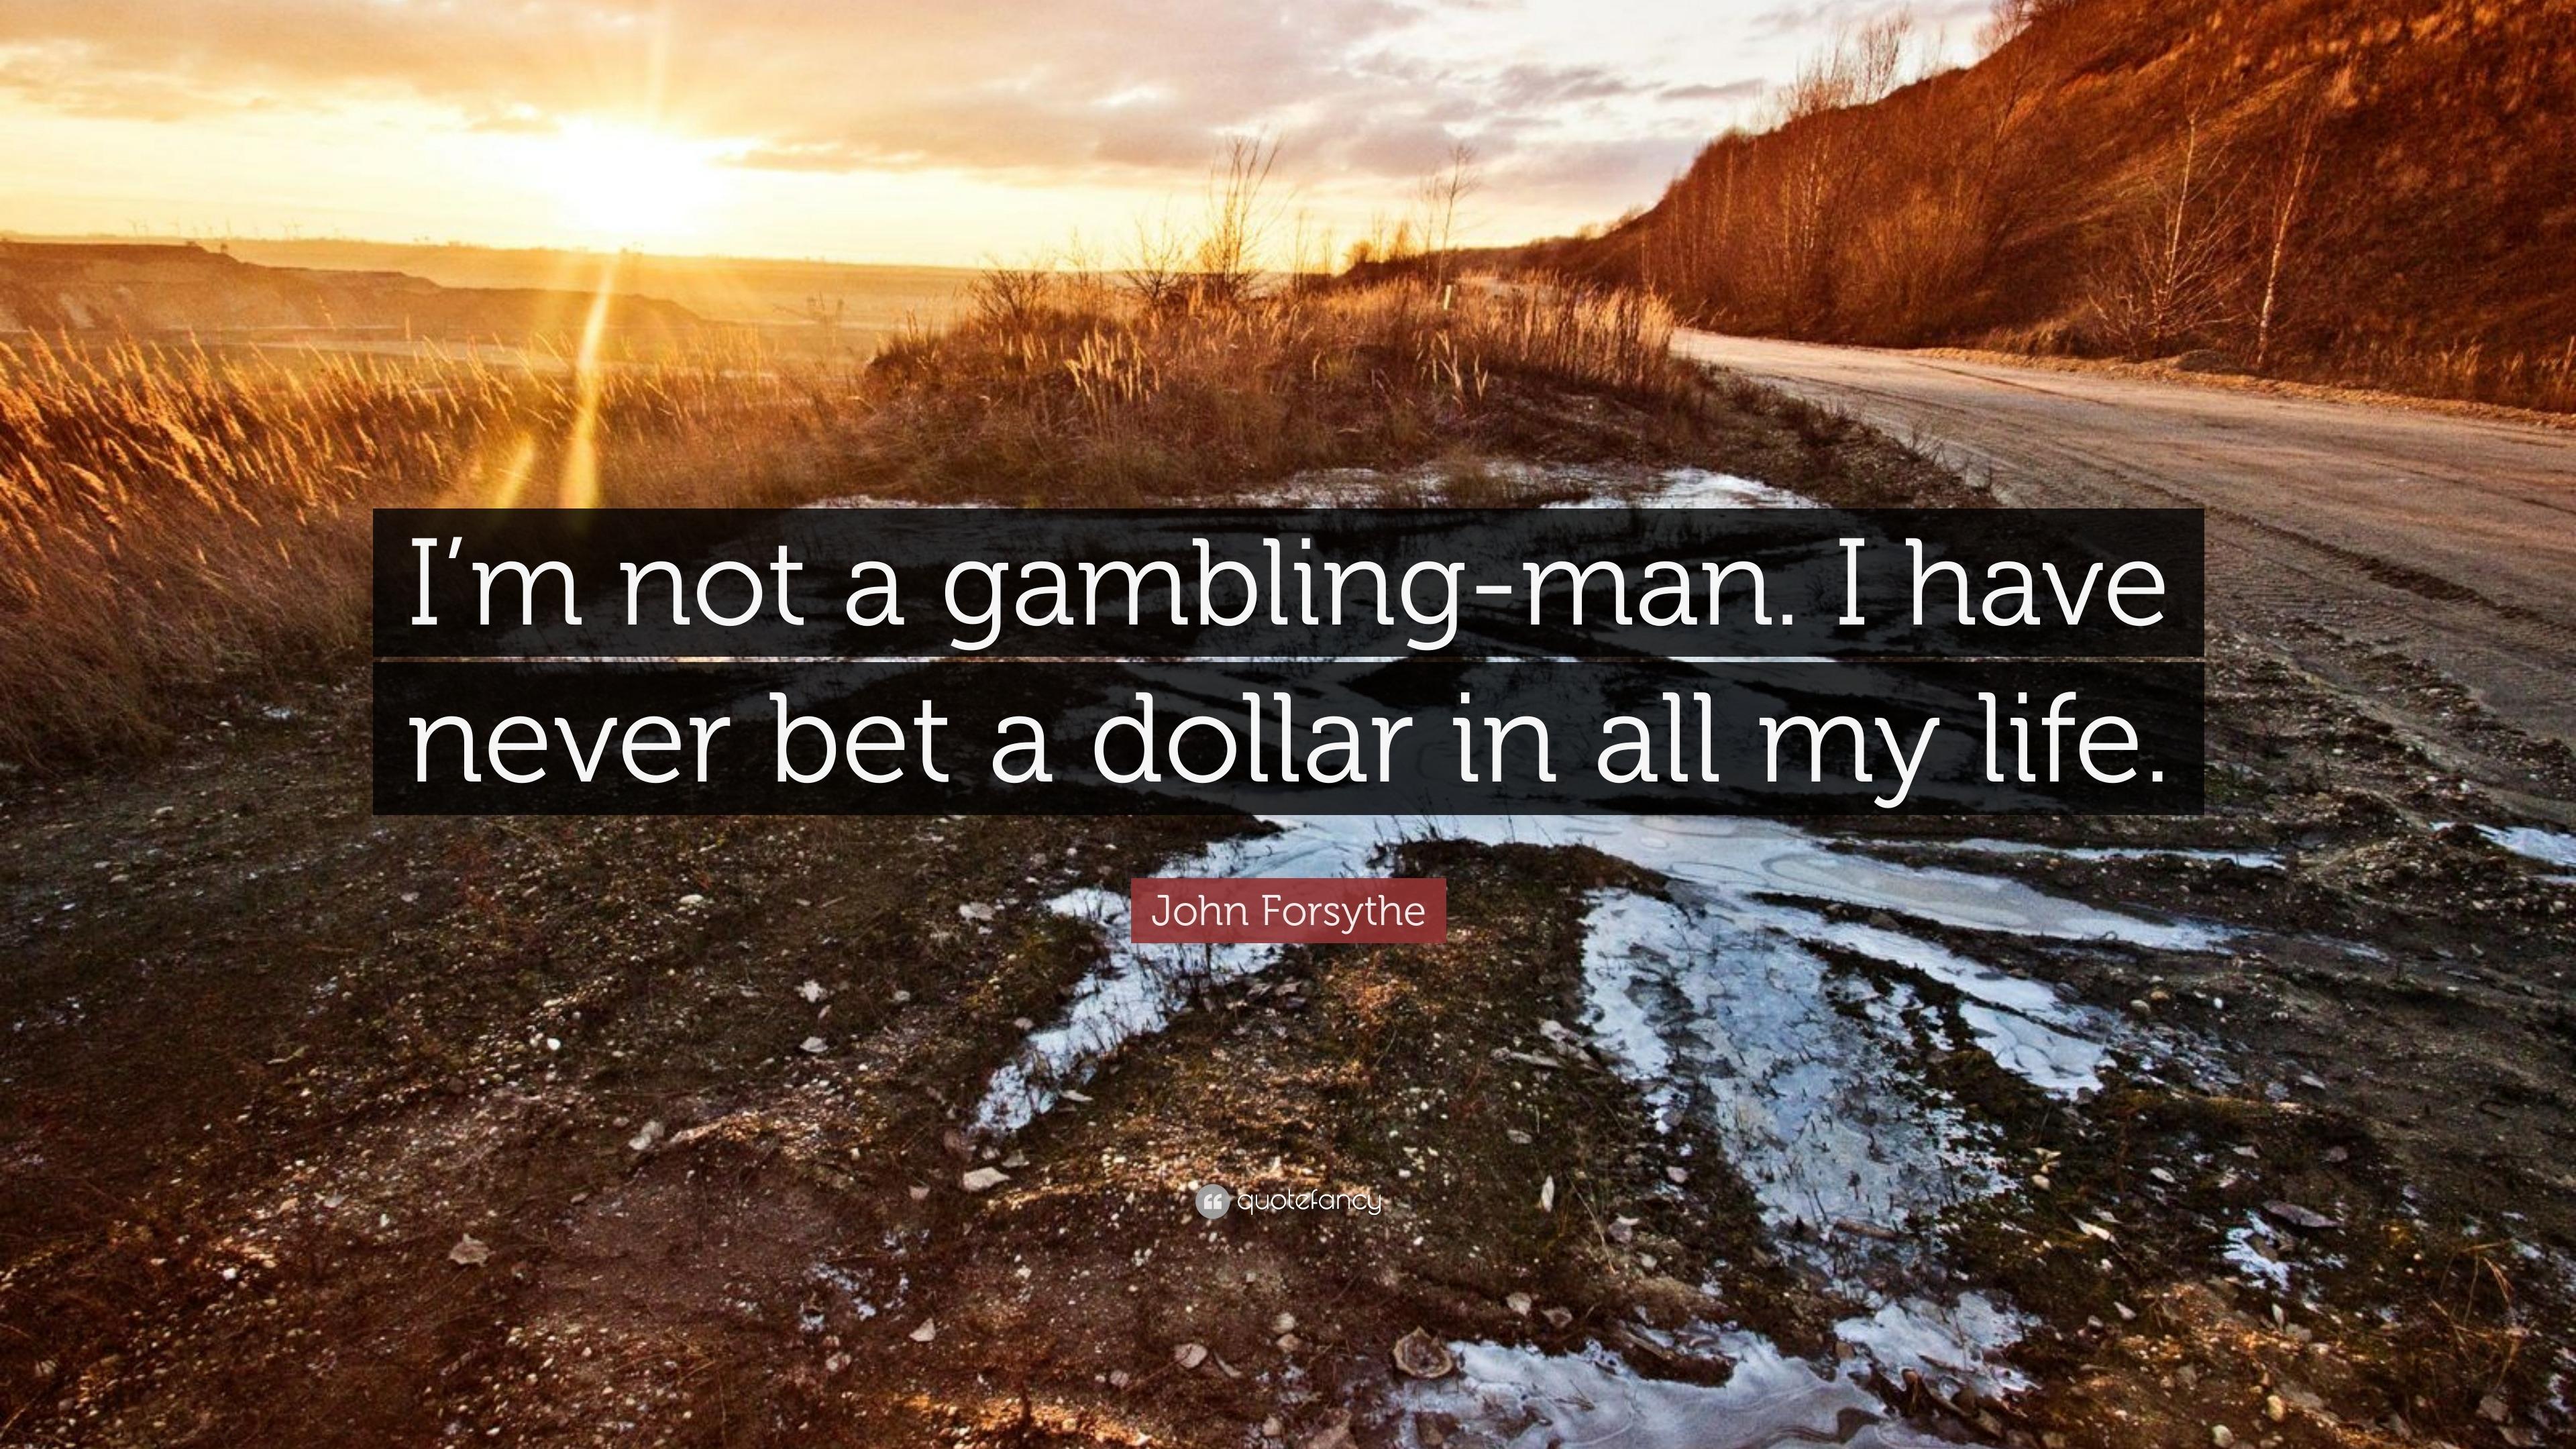 Louisiana riverboat casino revenues